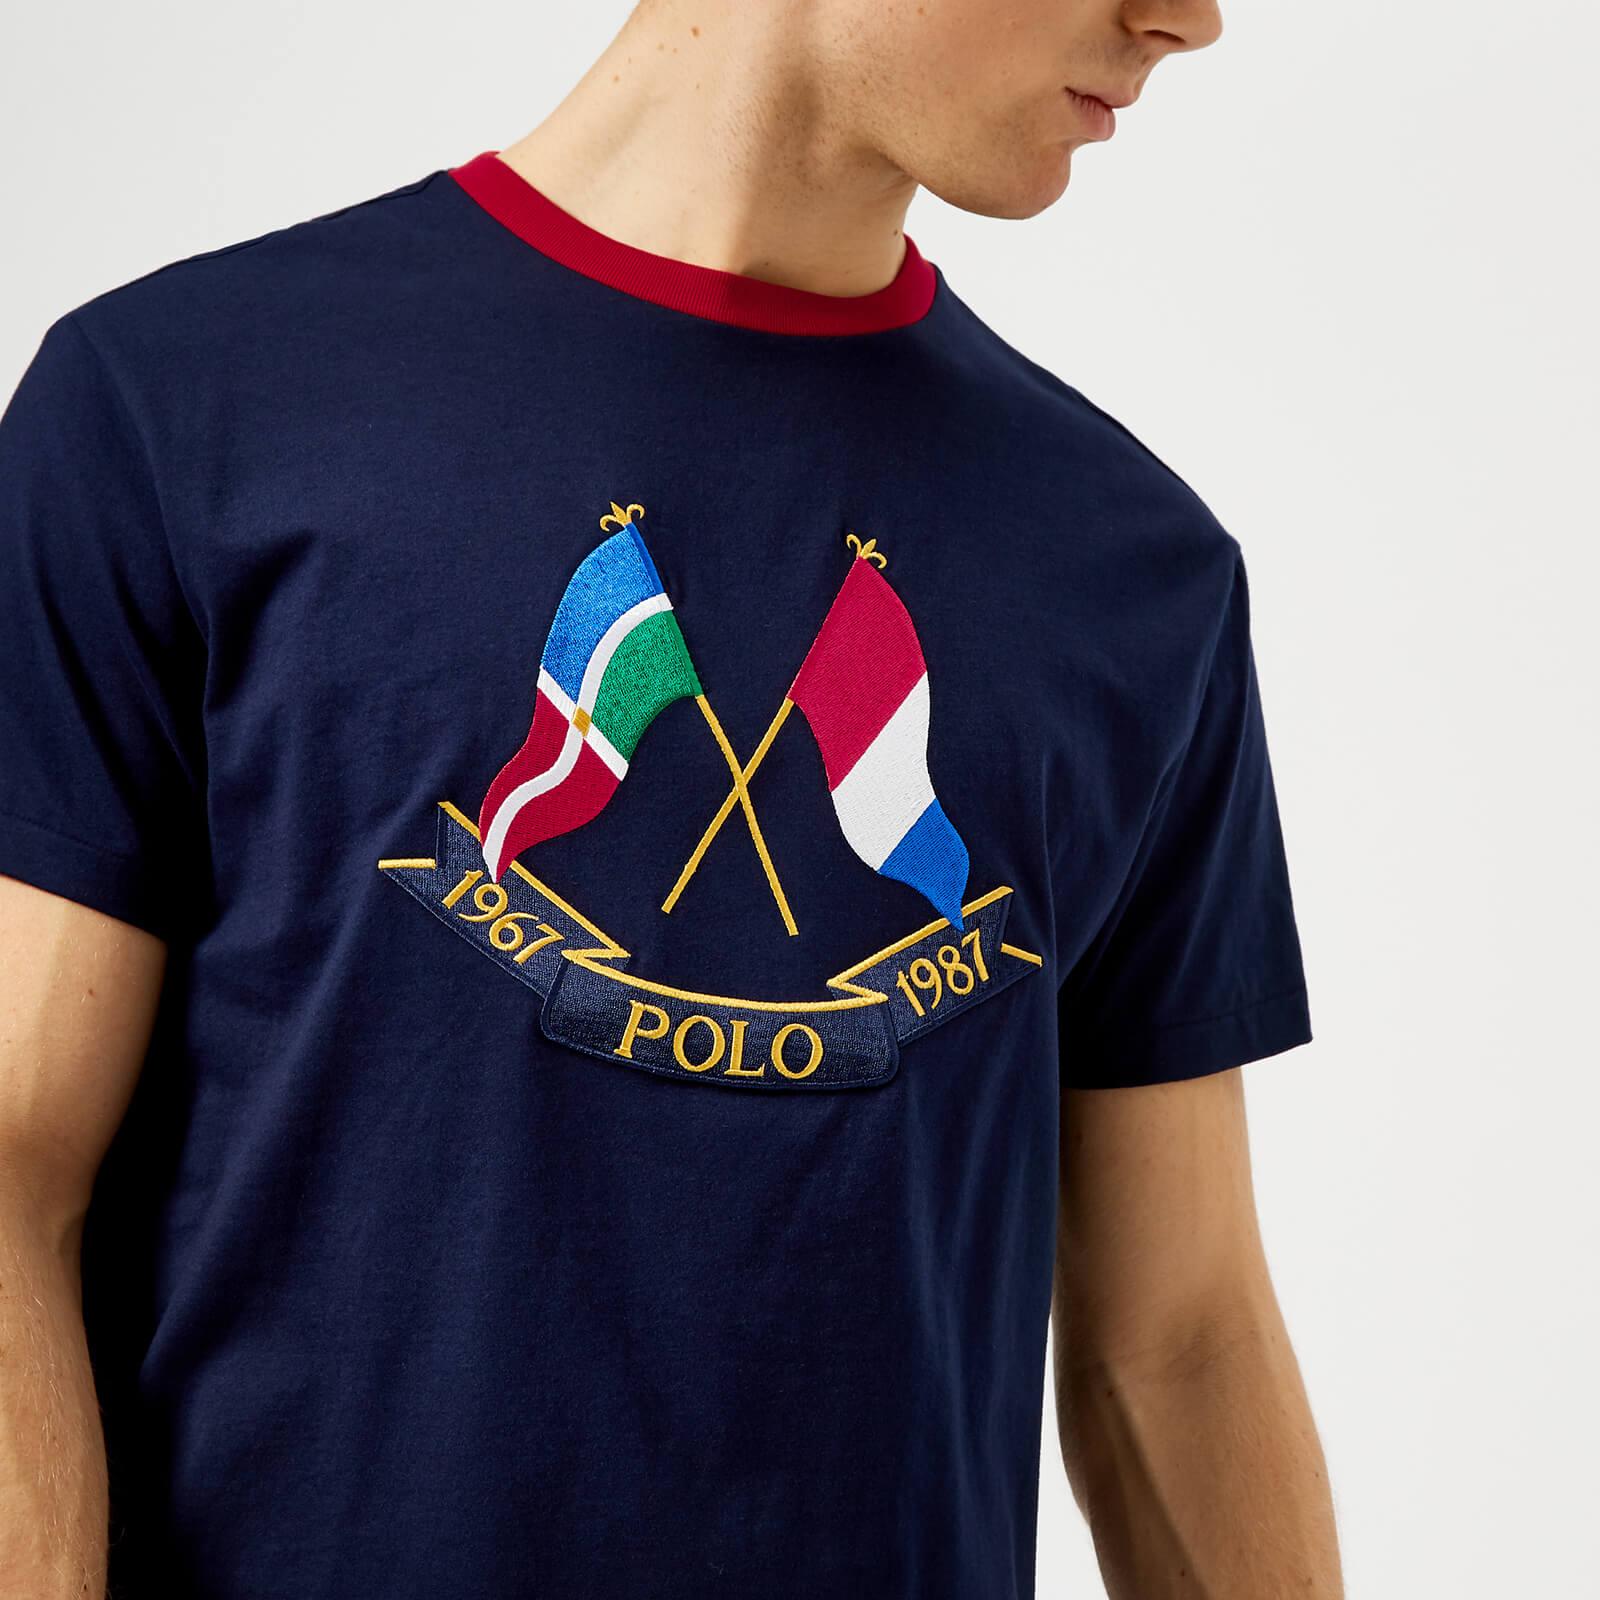 fc355cbd66c7 Polo Ralph Lauren Men s Cross Flags T-Shirt - Cruise Navy - Free UK  Delivery over £50